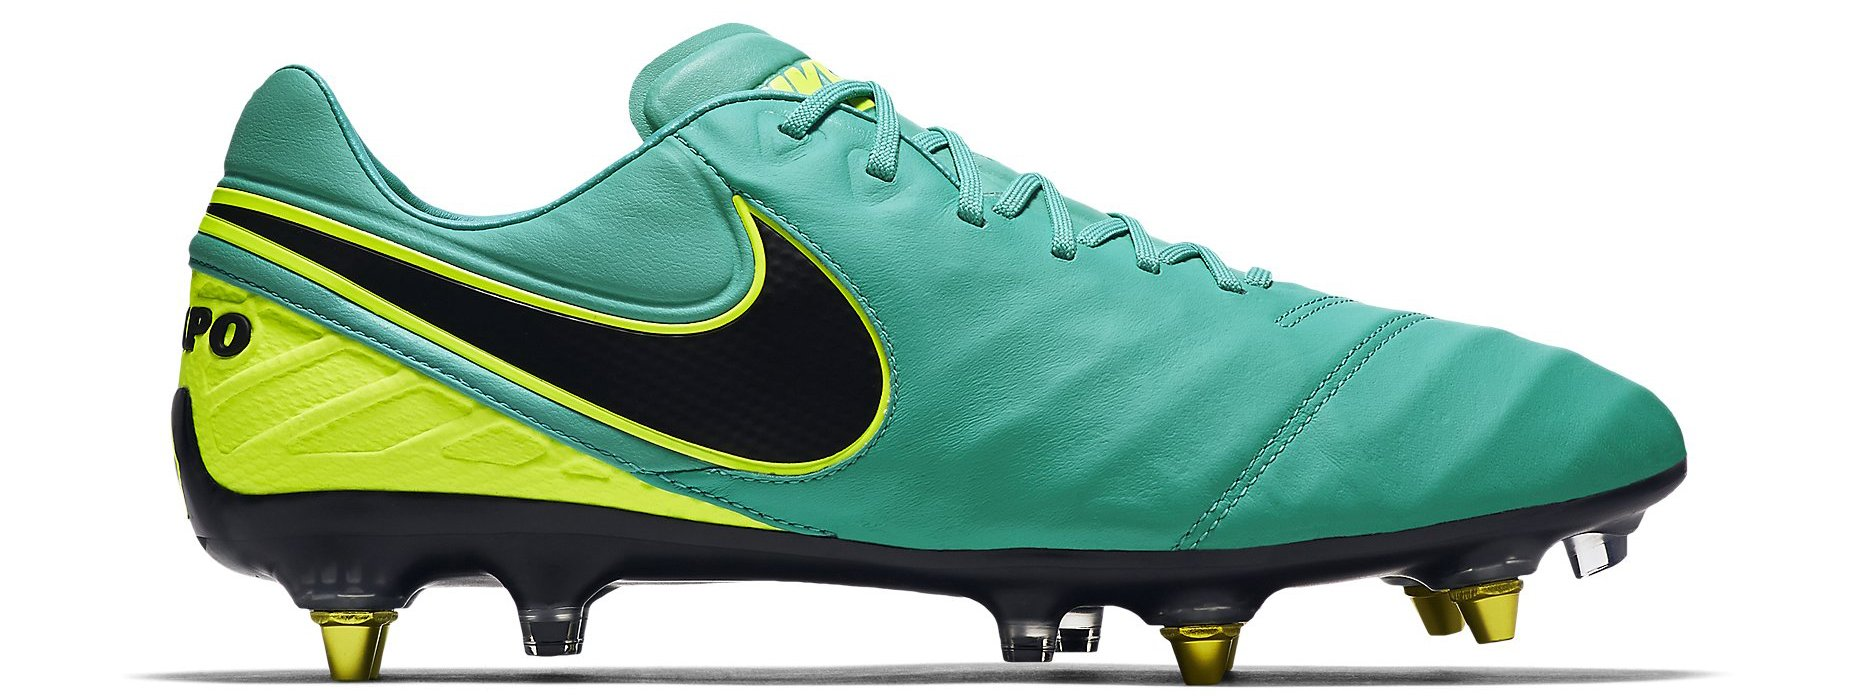 Kopačky Nike Tiempo Legend VI SG-PRO Anti Clog Traction